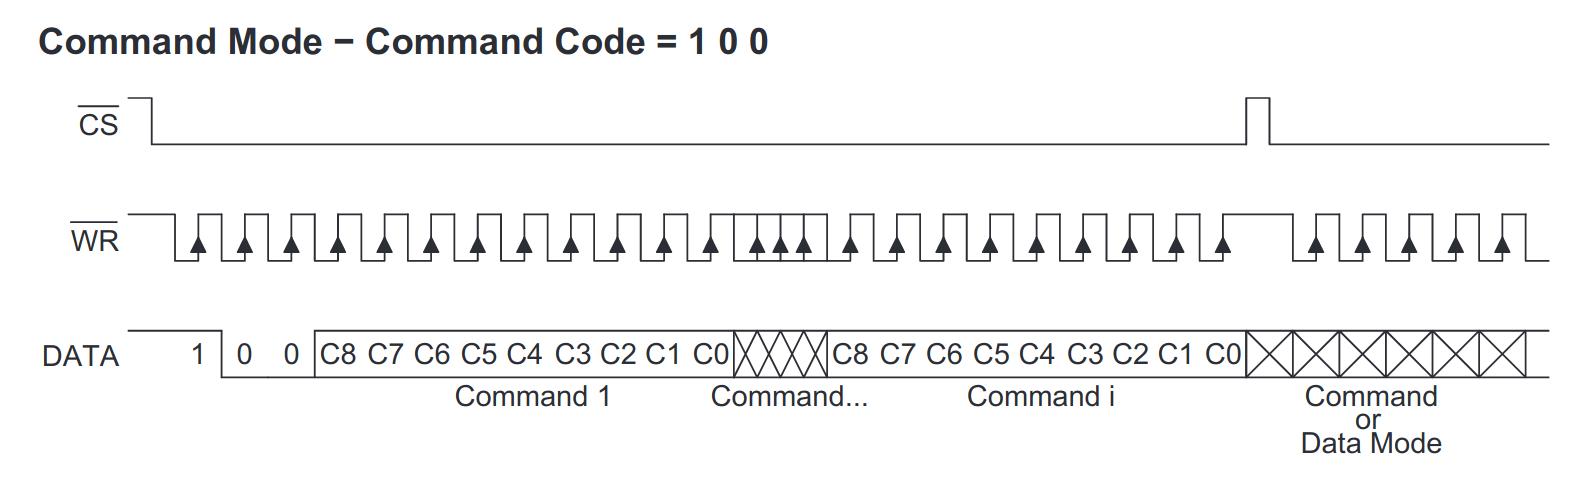 HT1632C command mode